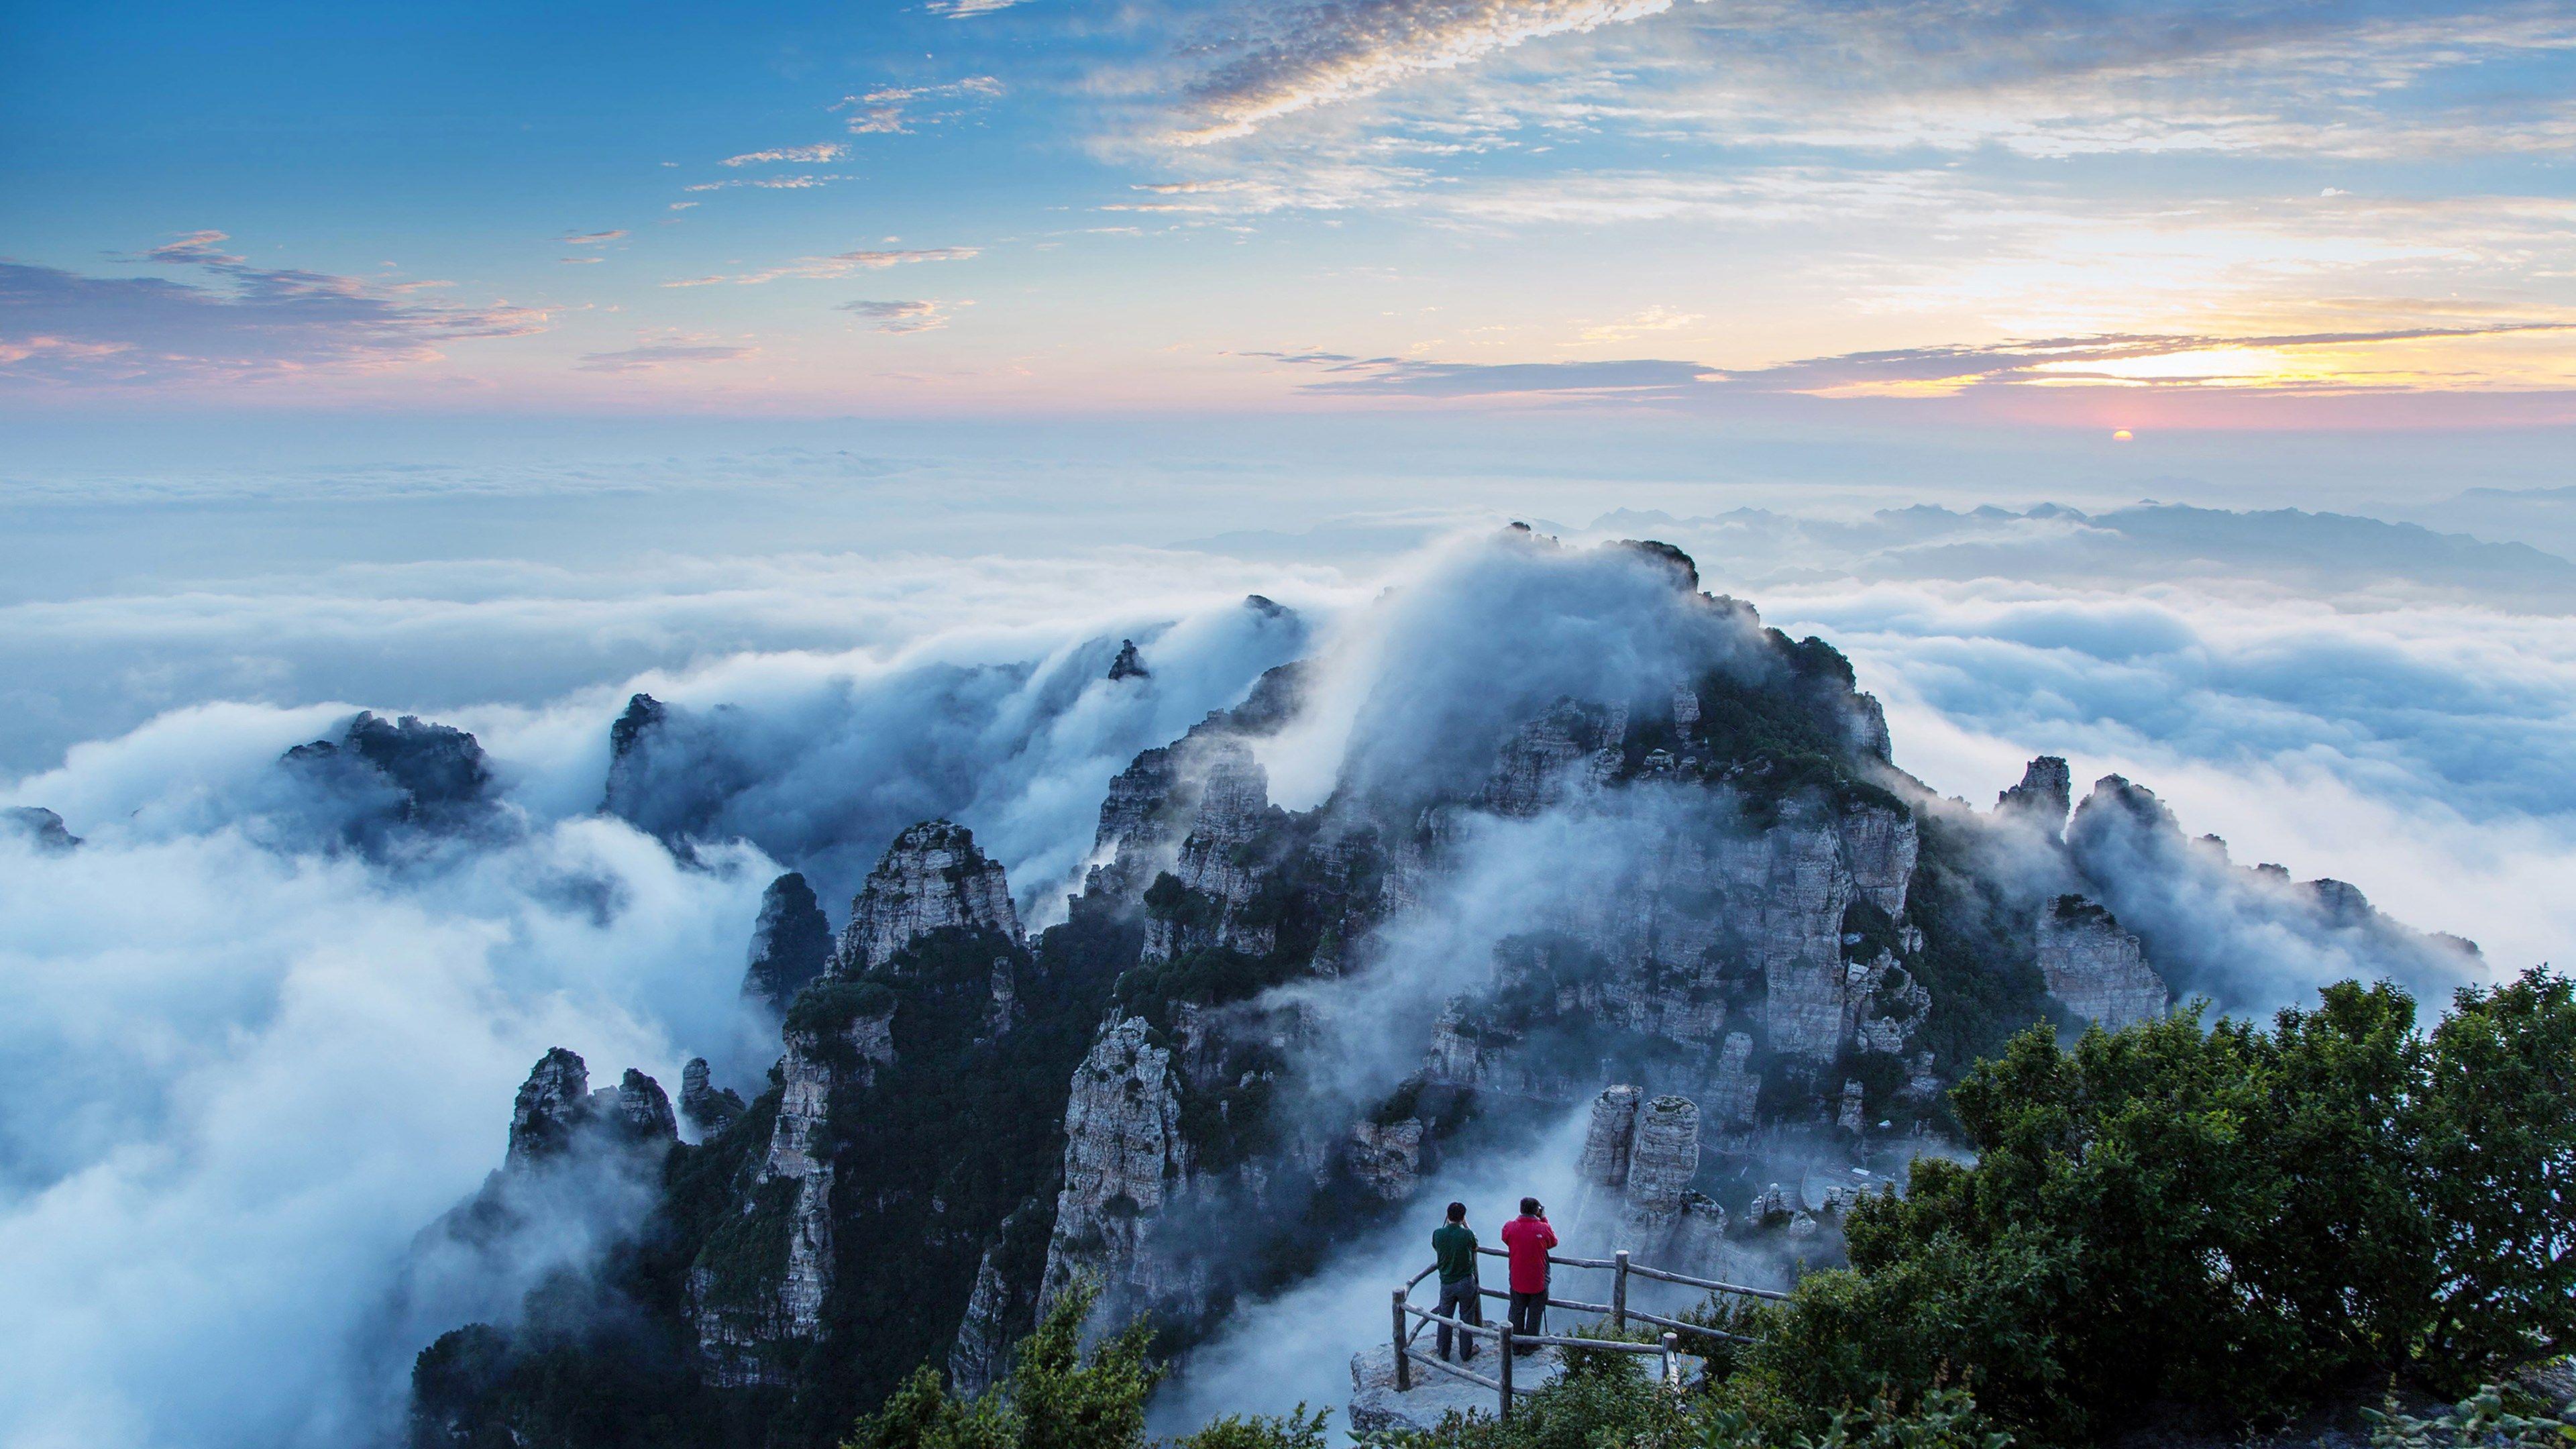 4k download wallpaper free (3840x2160) Пейзажи, Туман, Альпы